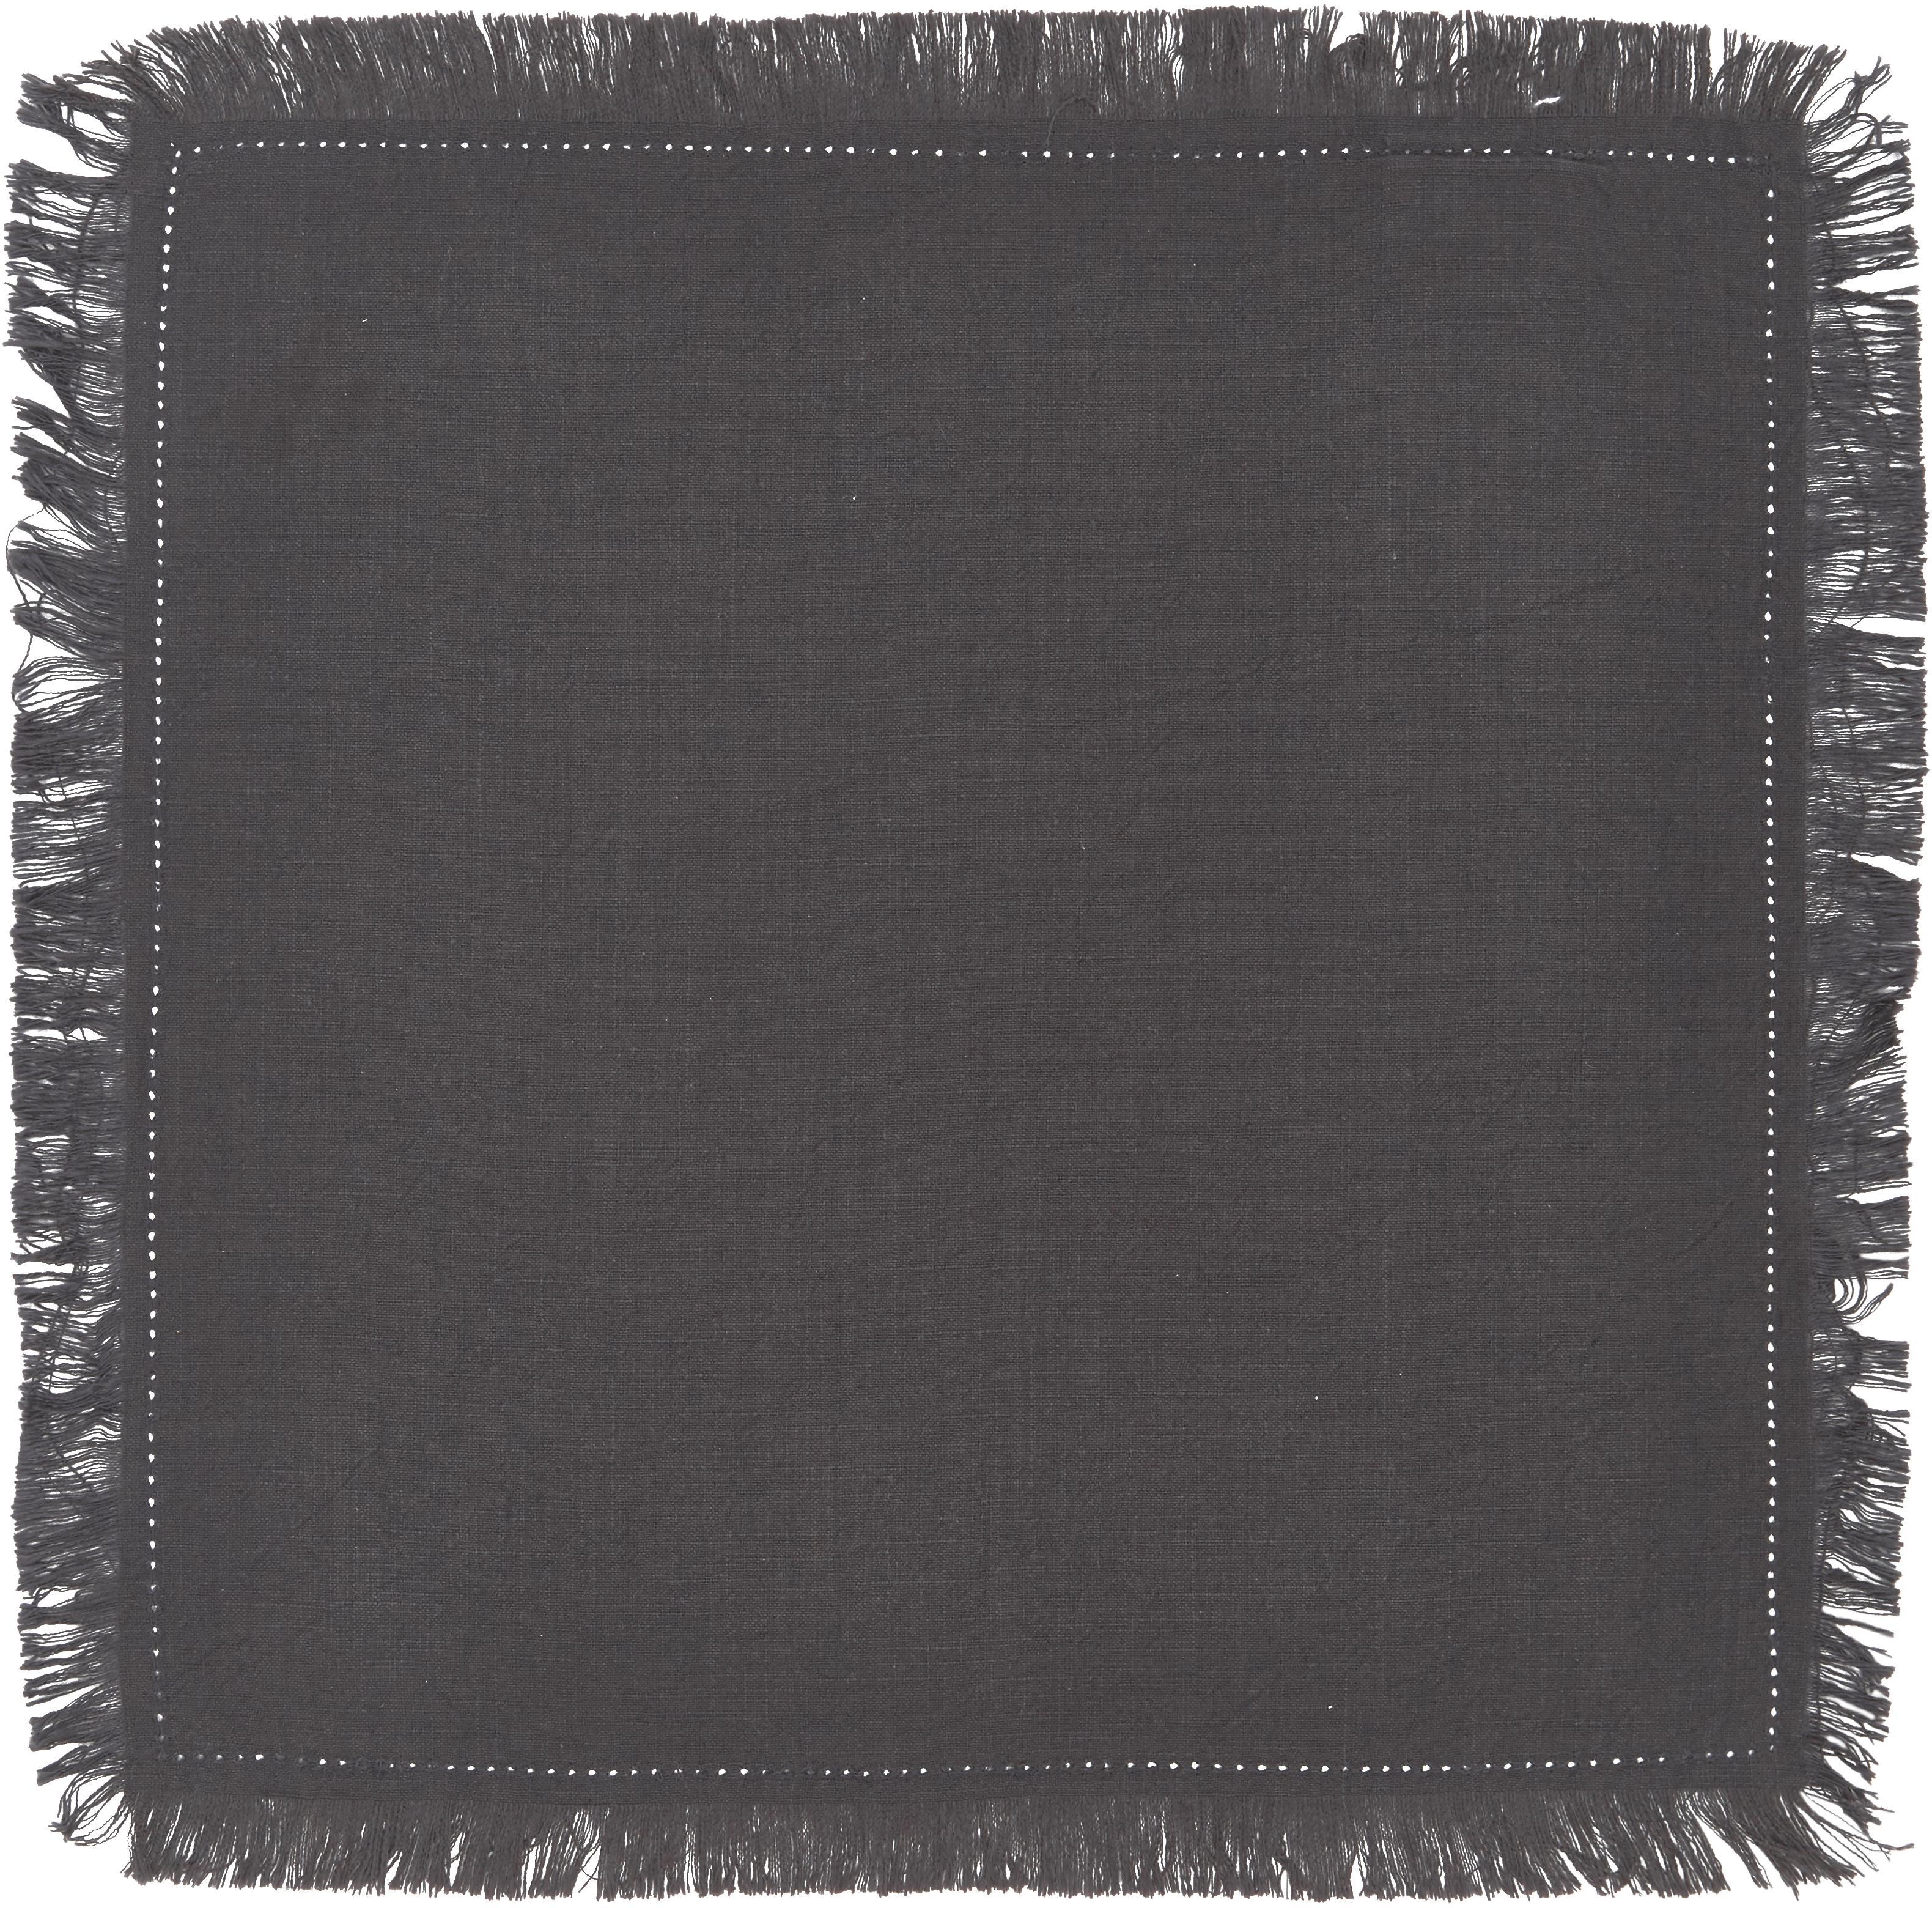 Katoenen servetten Hilma met franjes, 2 stuks, Katoen, Zwart, 45 x 45 cm